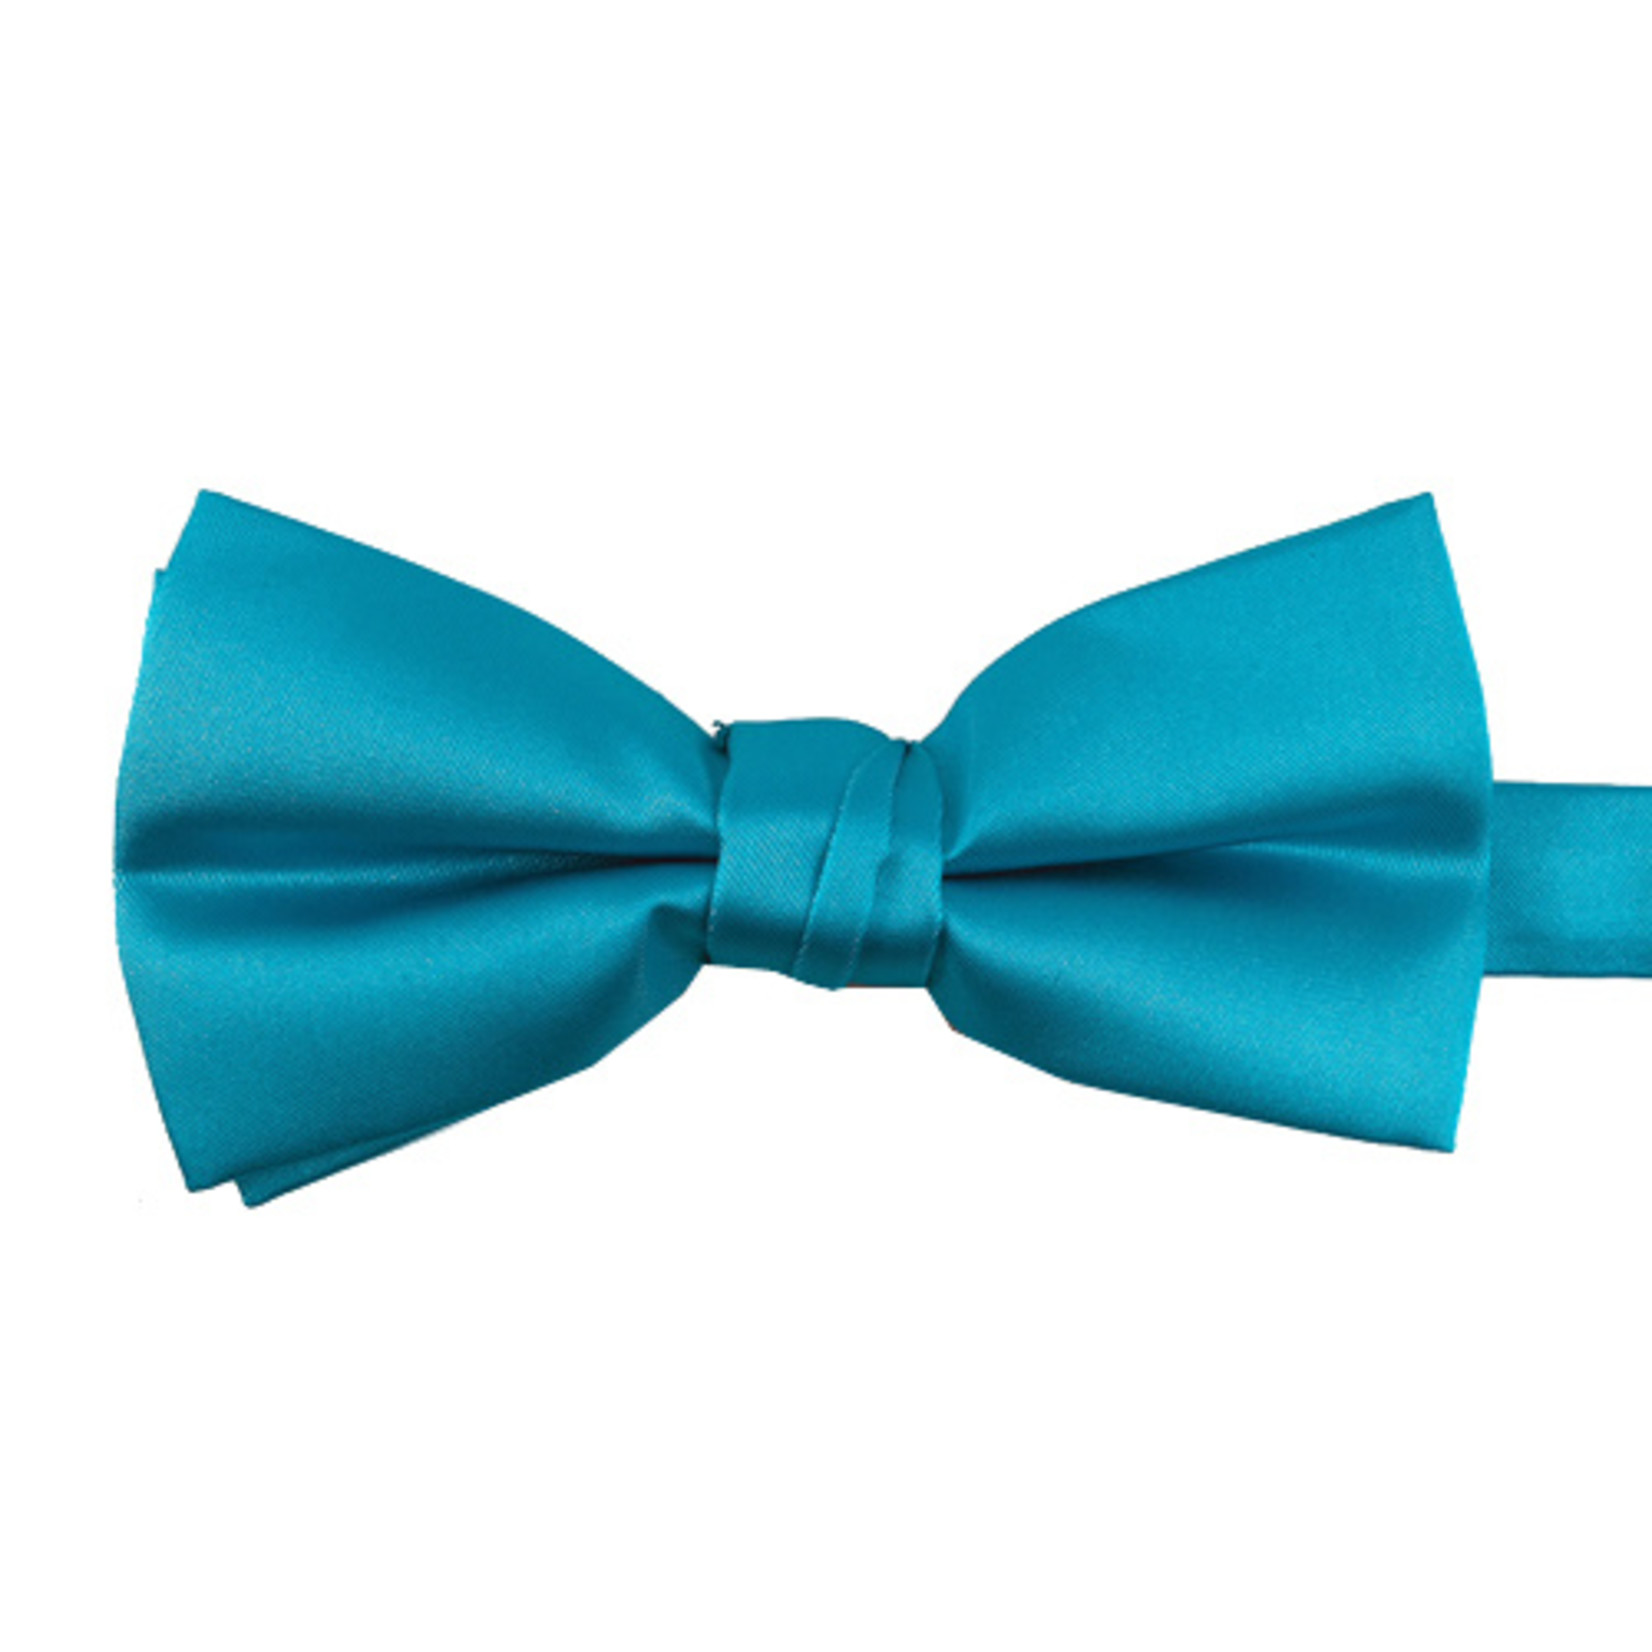 Knotz M100BT-20 Solid Turquoise Bowtie